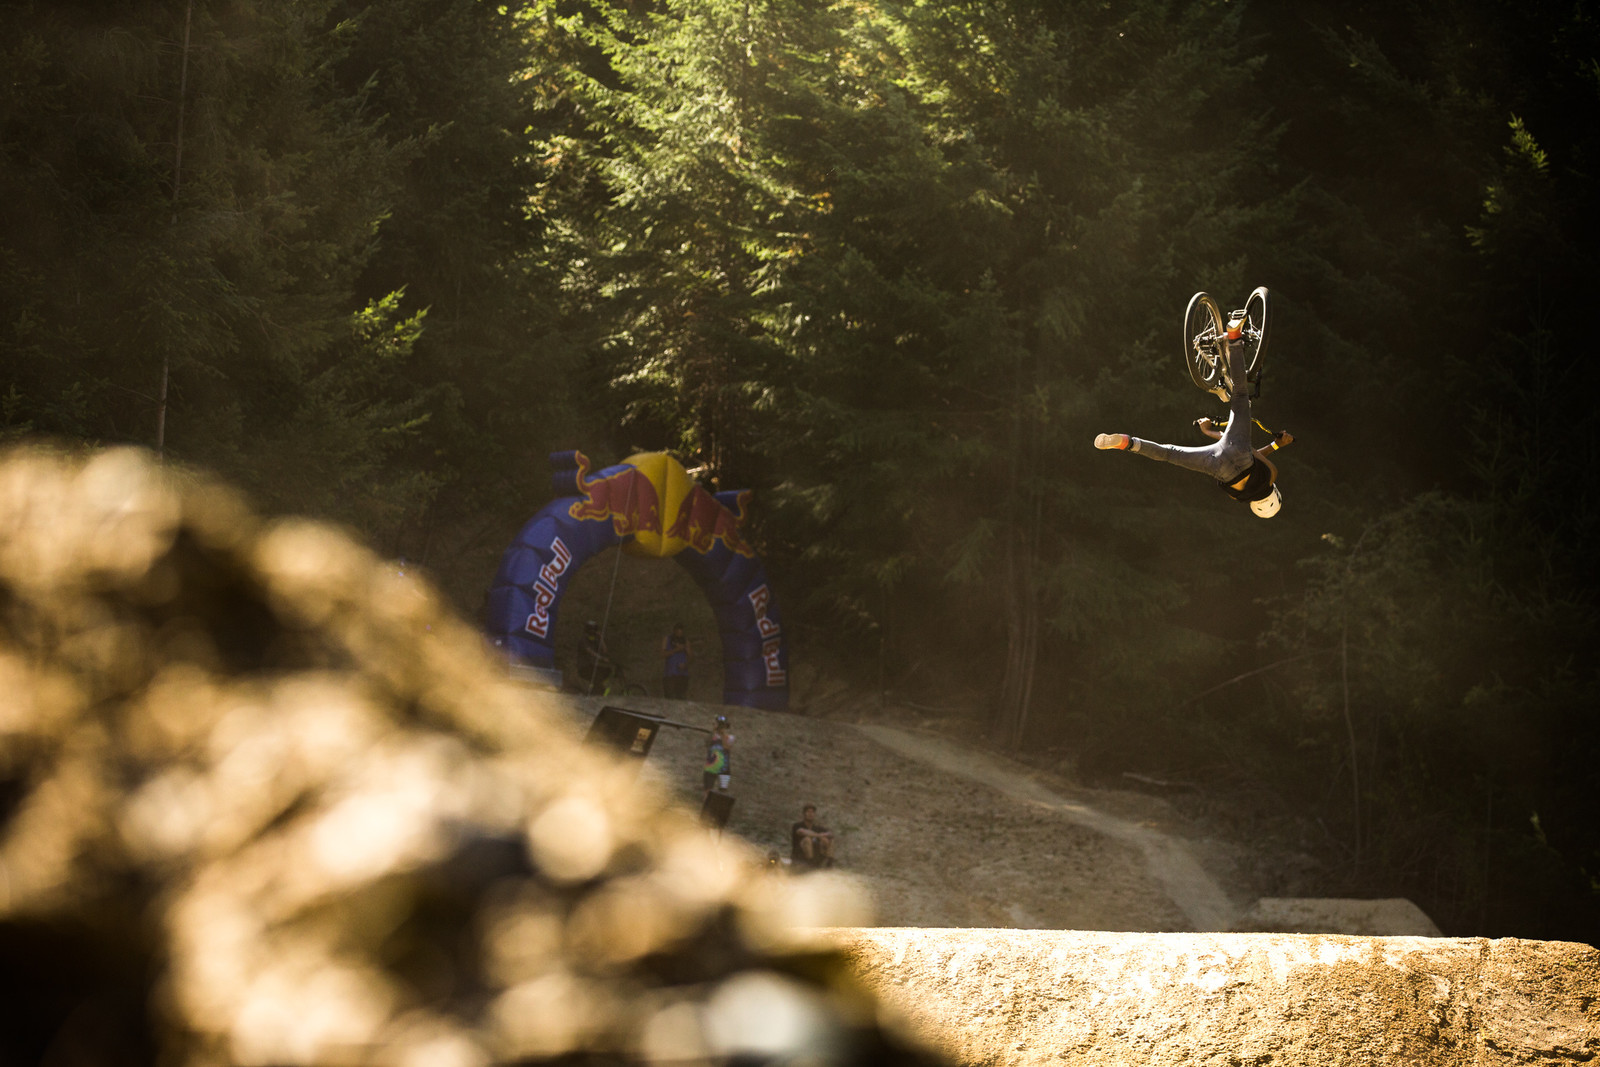 Flip 1-foot-X - McGazza Fest Dream Track Jam - Mountain Biking Pictures - Vital MTB